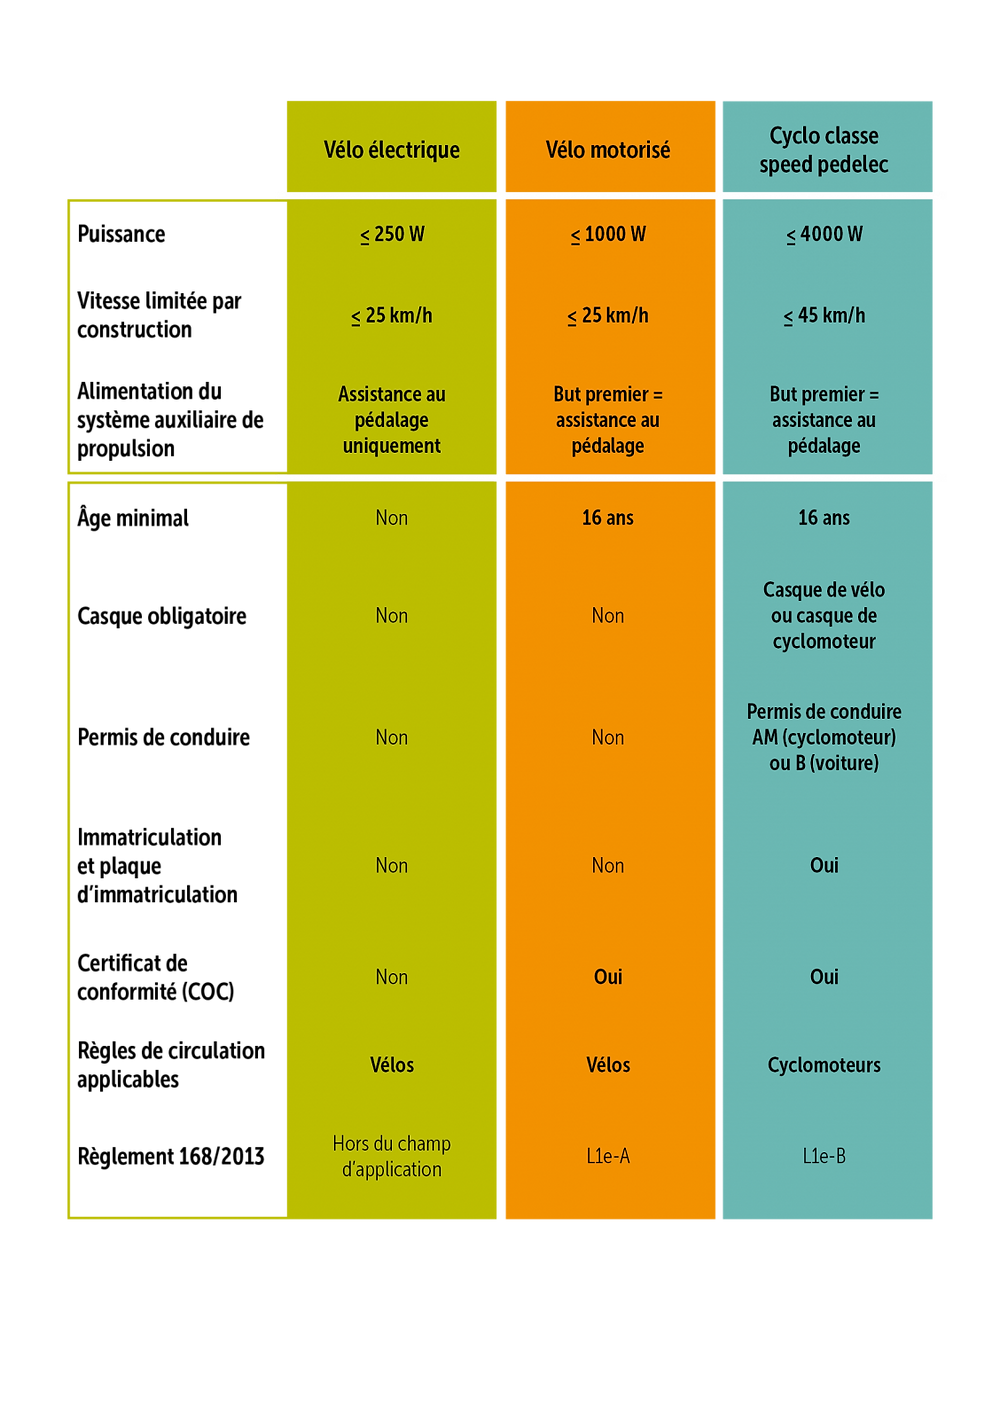 Type of bike comparison (e-bike vs speedpedelec)